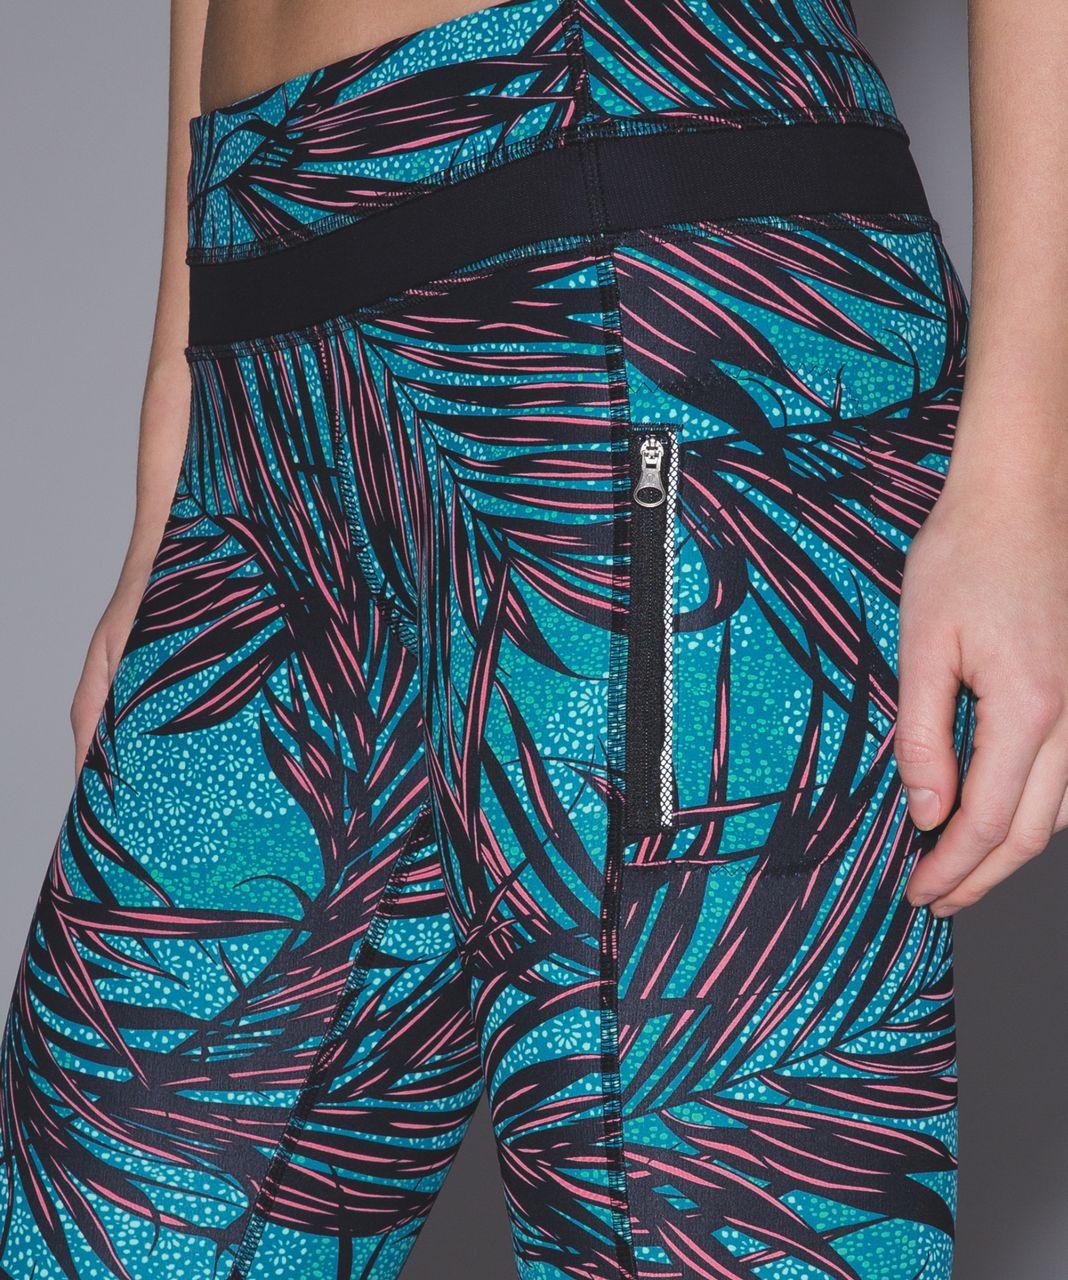 Lululemon Inspire Tight II - Palm Lace Tofino Teal Multi